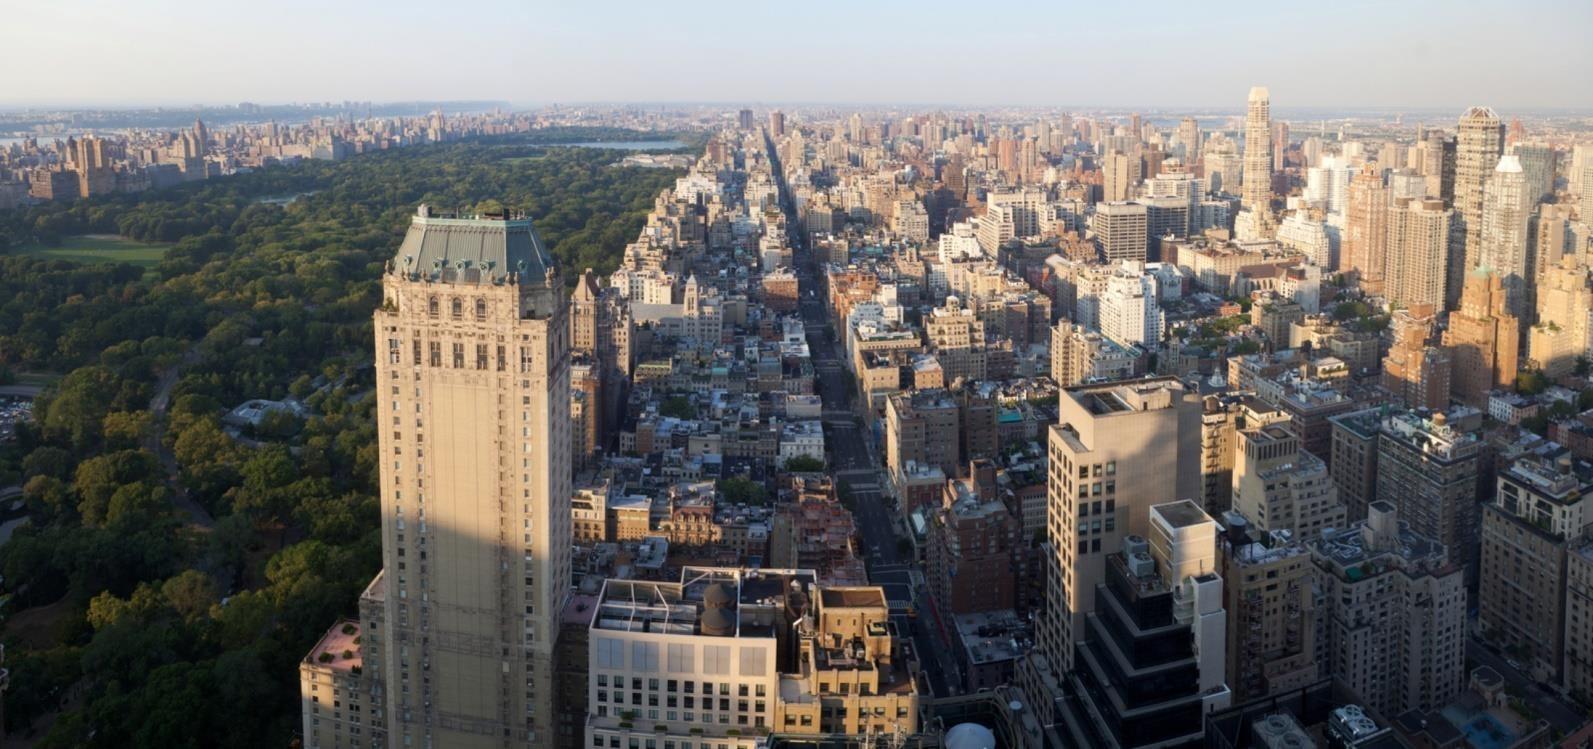 Upper East Side 上东区鸟瞰